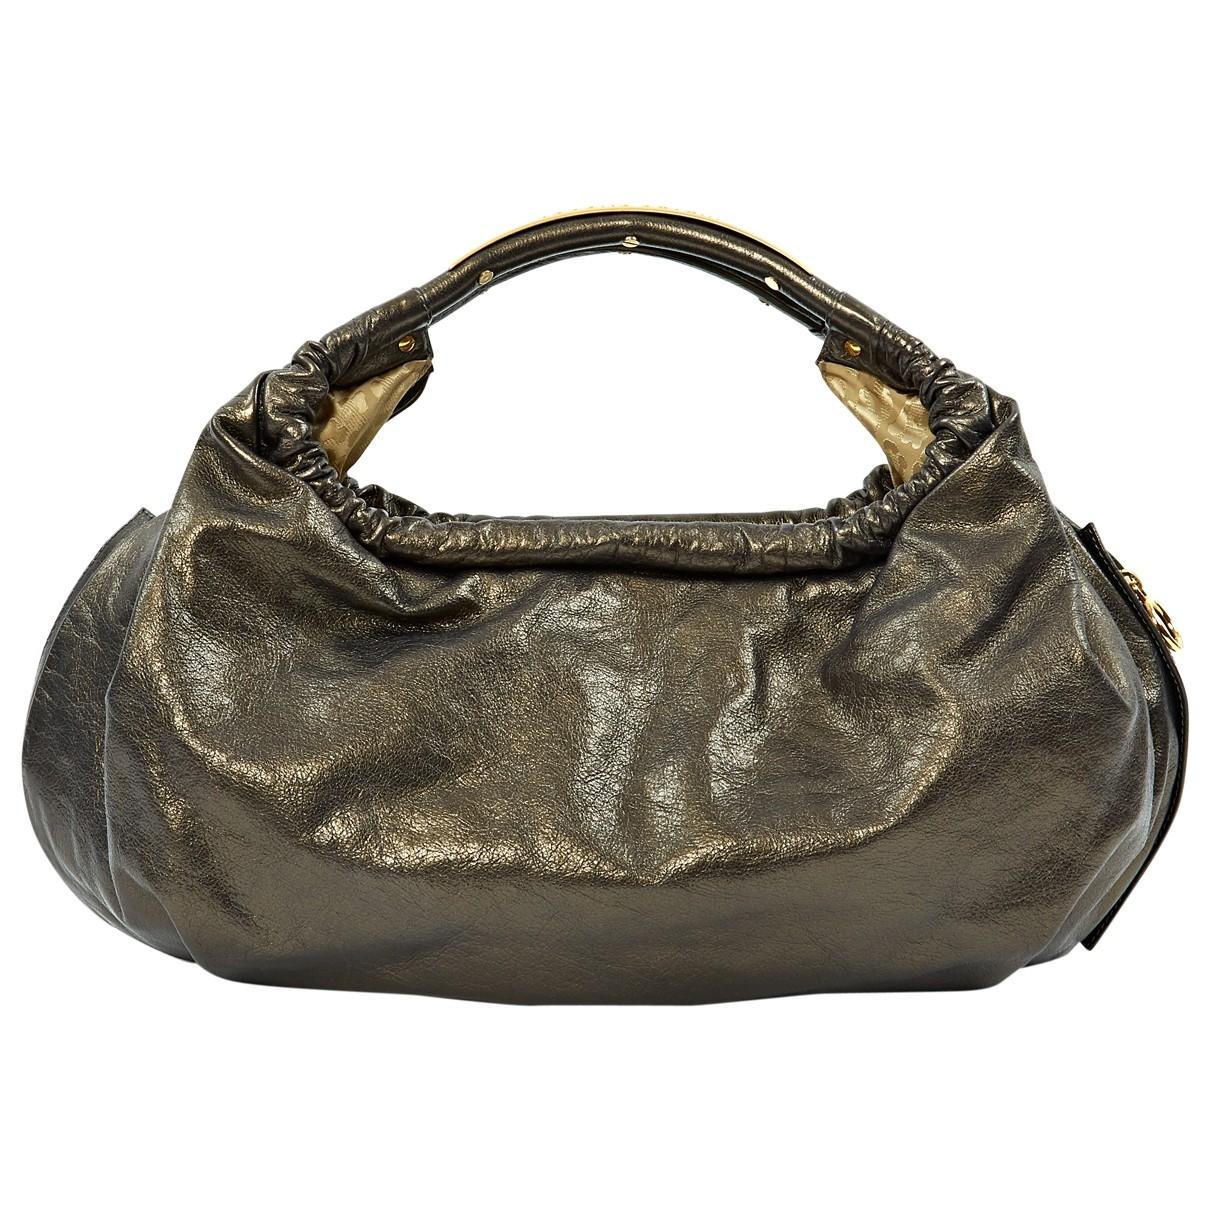 Roberto Cavalli \N Grey Patent leather handbag for Women \N